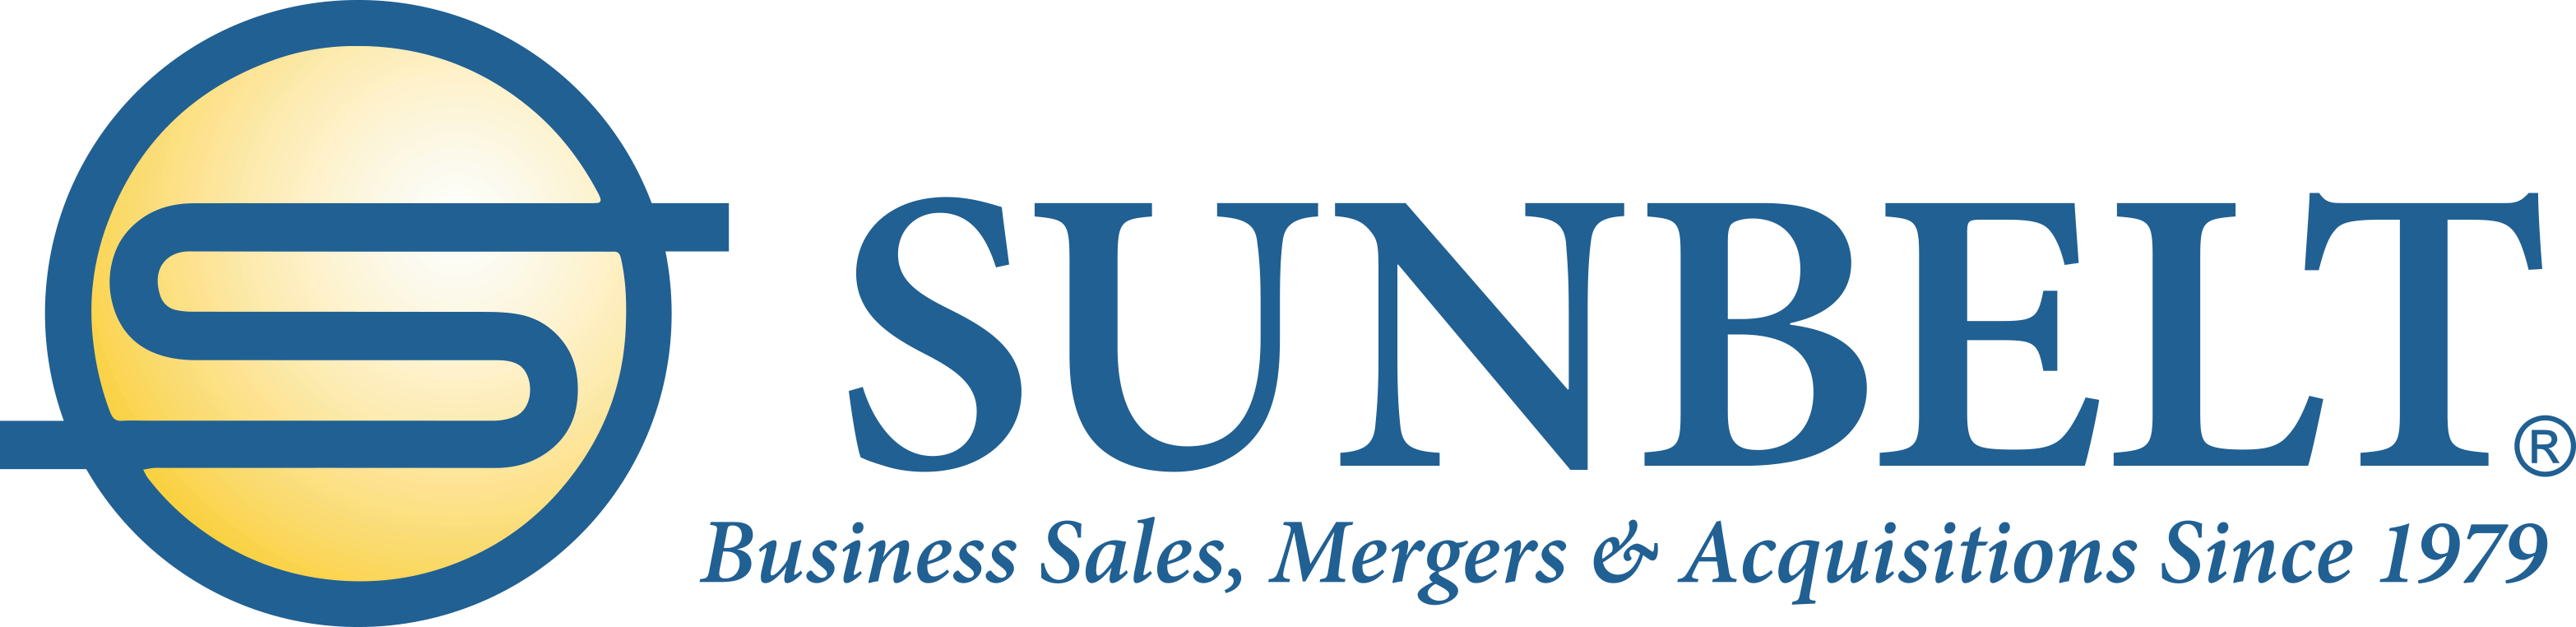 Sunbelt_PMS_Logos_Long